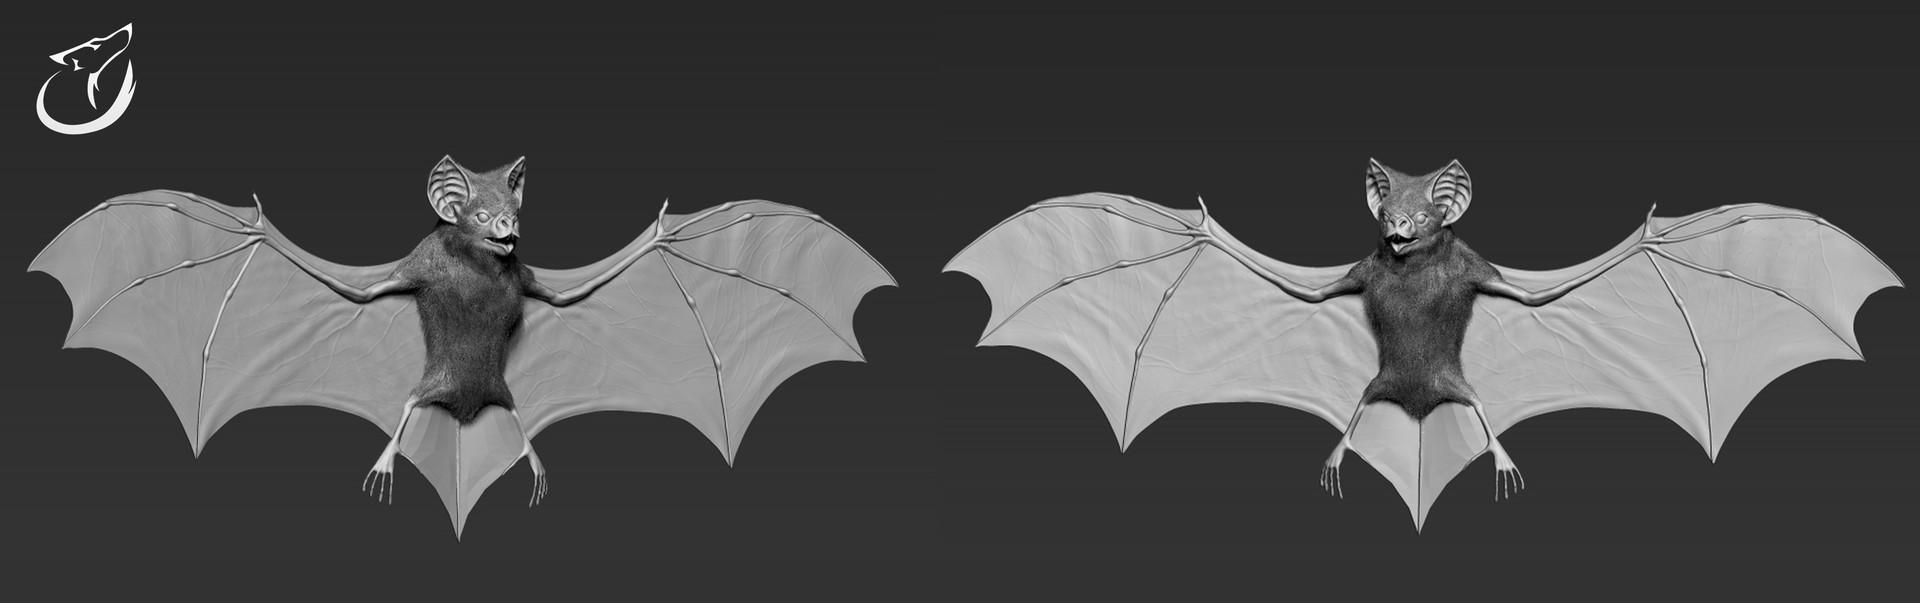 Andrew constantine bat zbrush